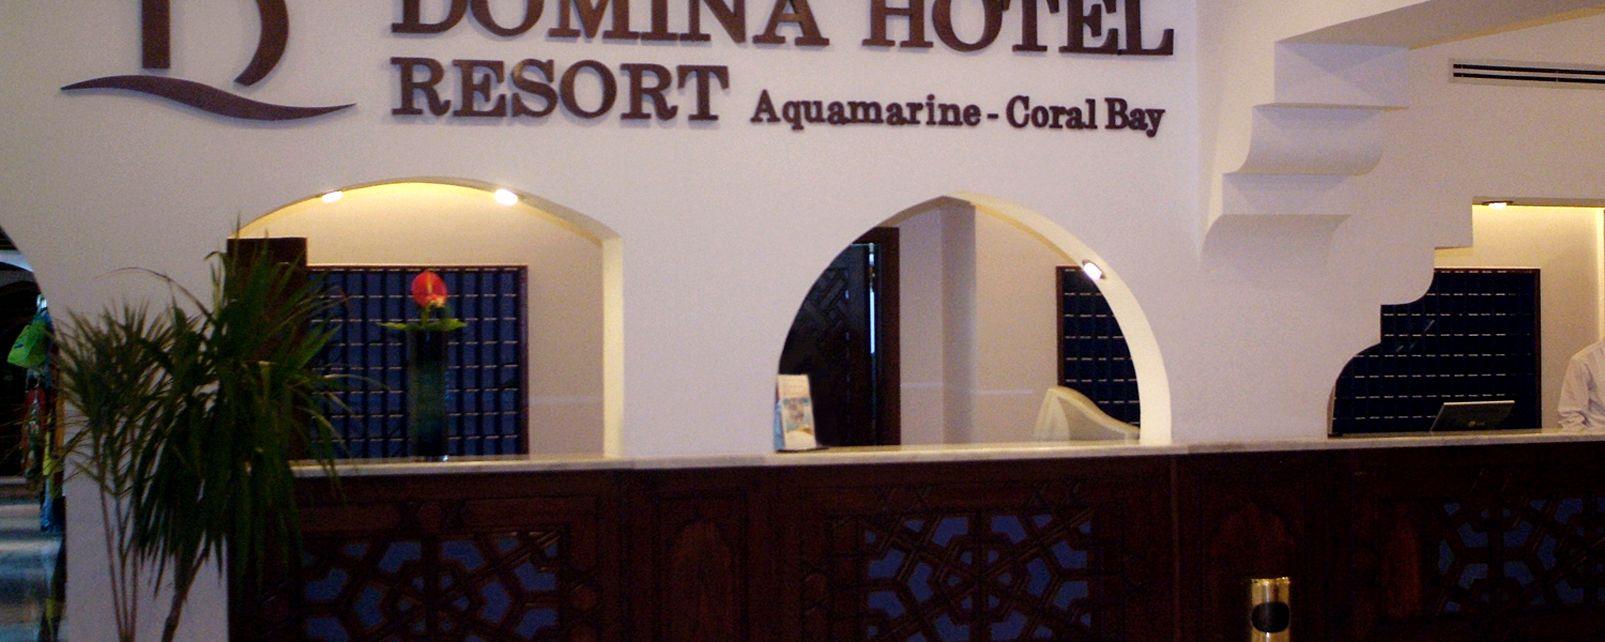 Hotel Domina Aquamarine Hotel Resort